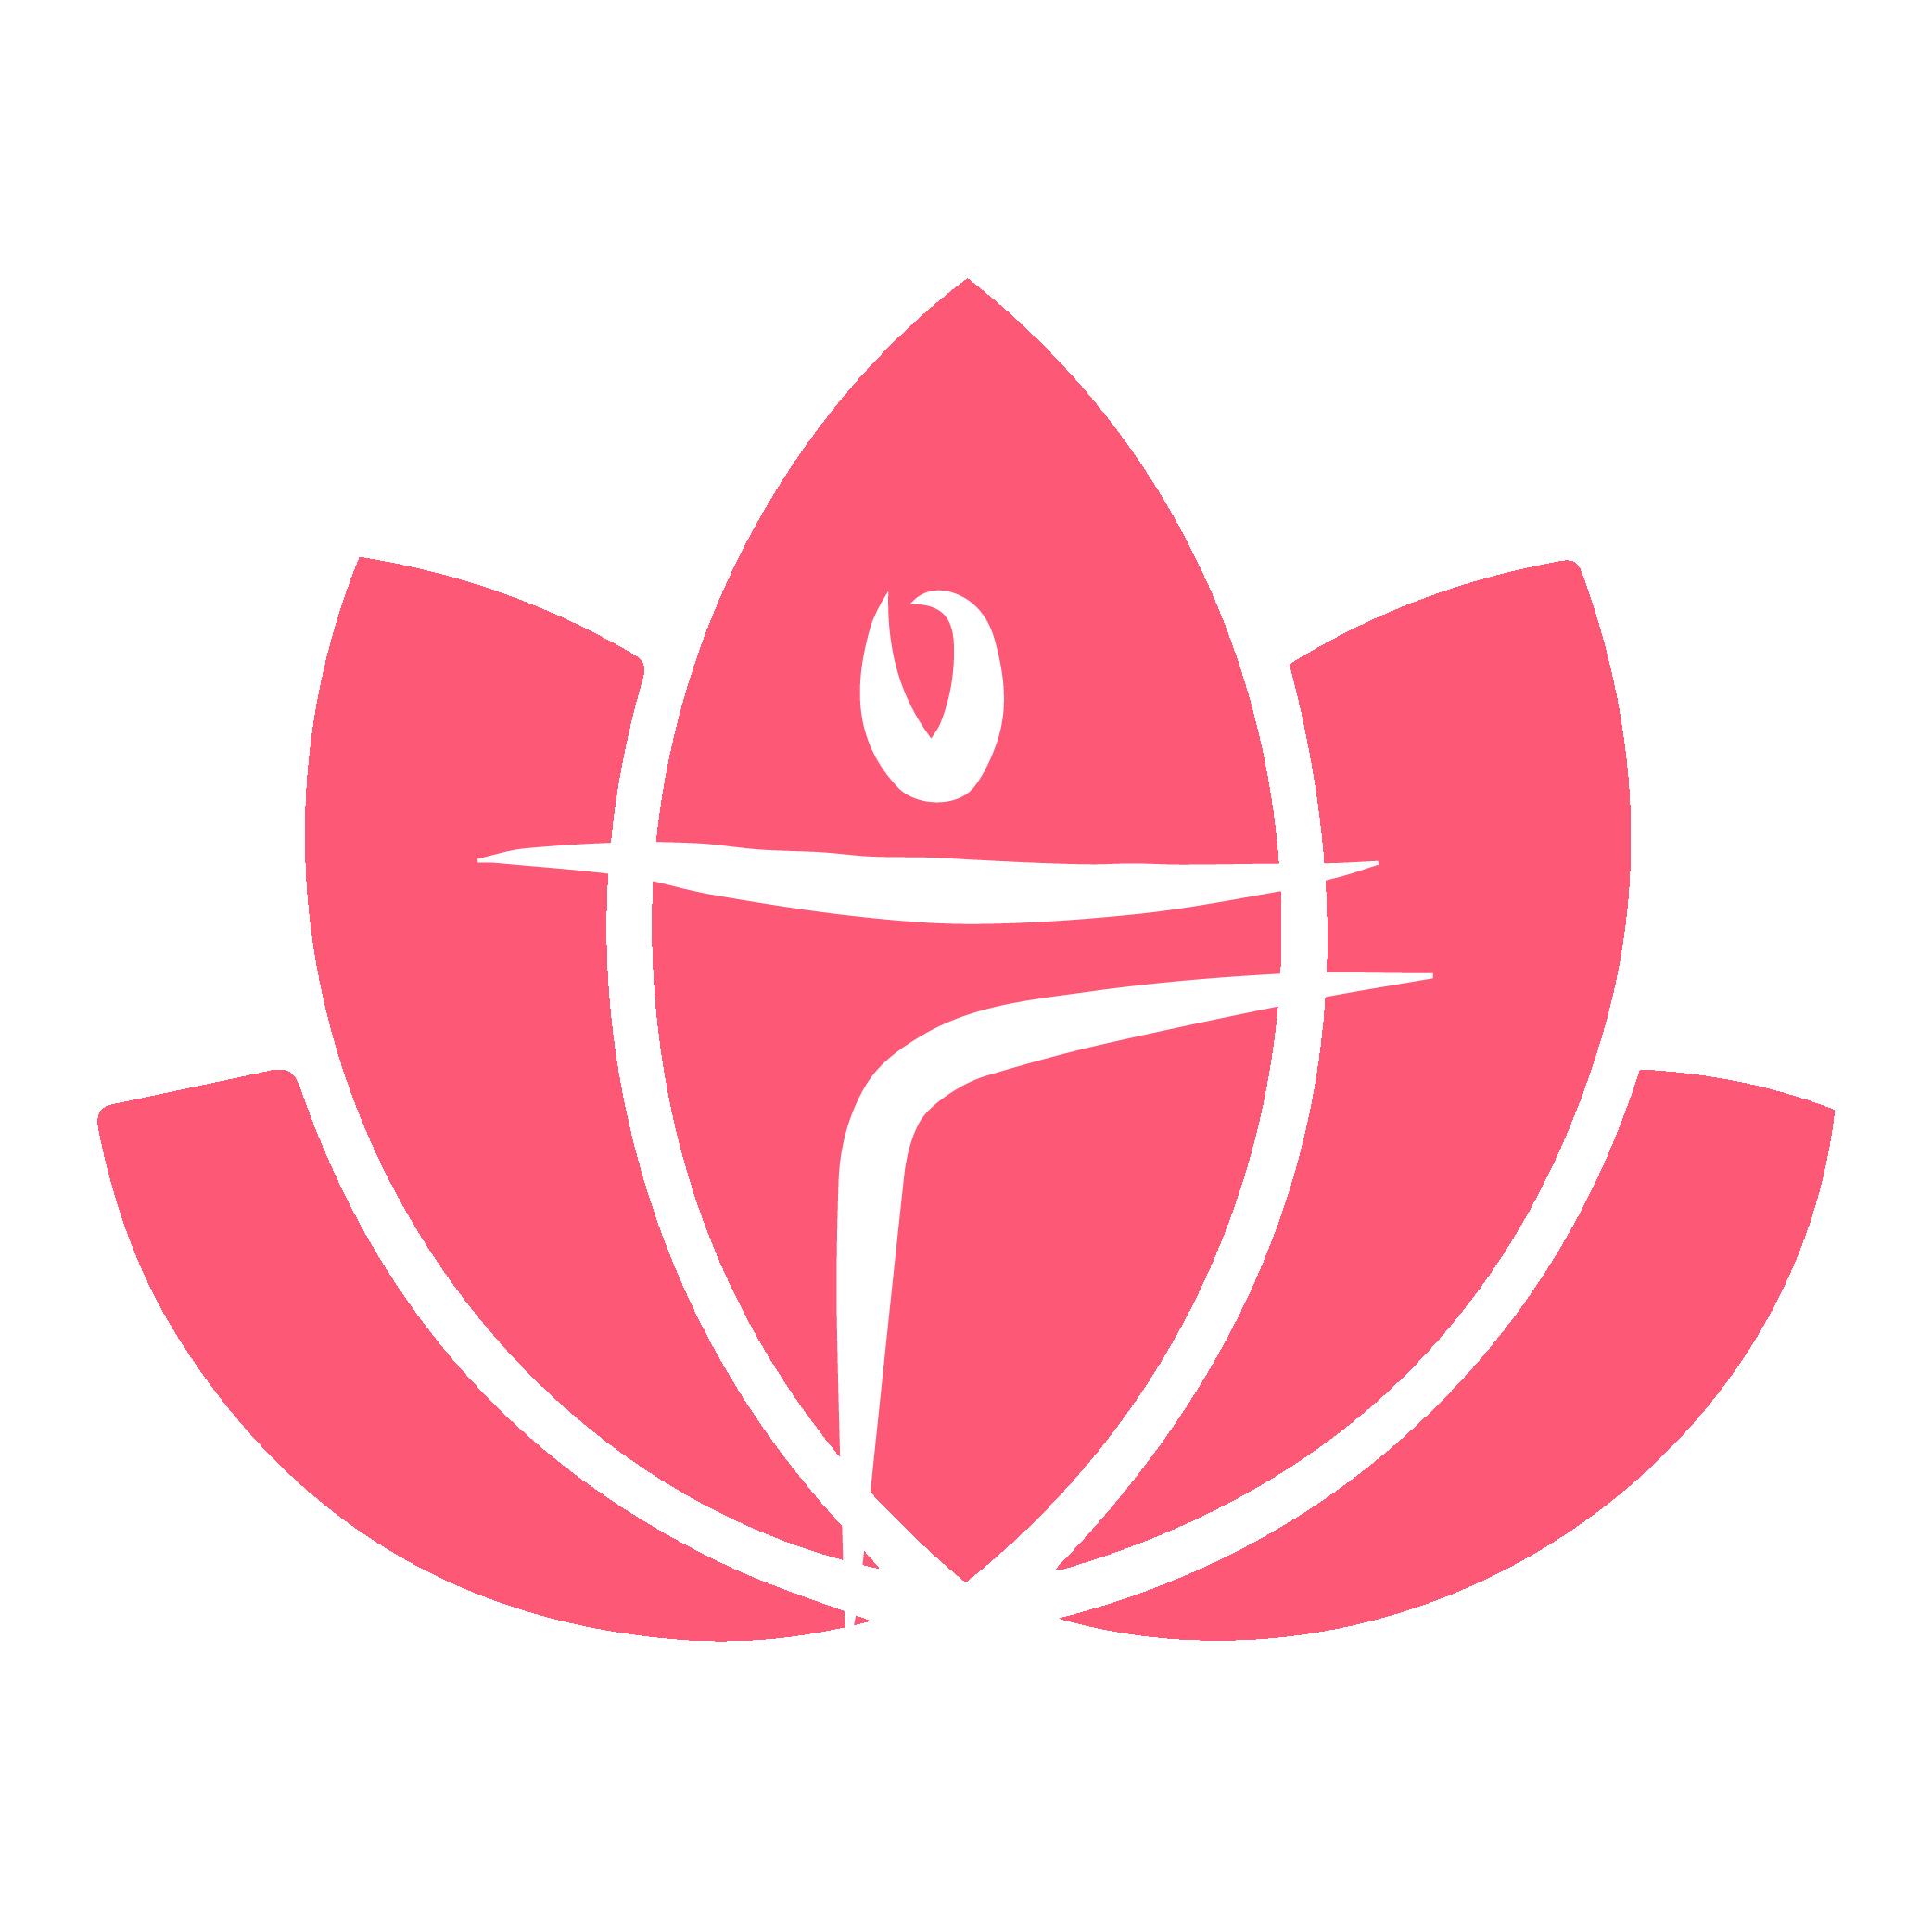 https://kamlayoga.com/wp-content/uploads/2020/03/logo-hatha-yoga.png